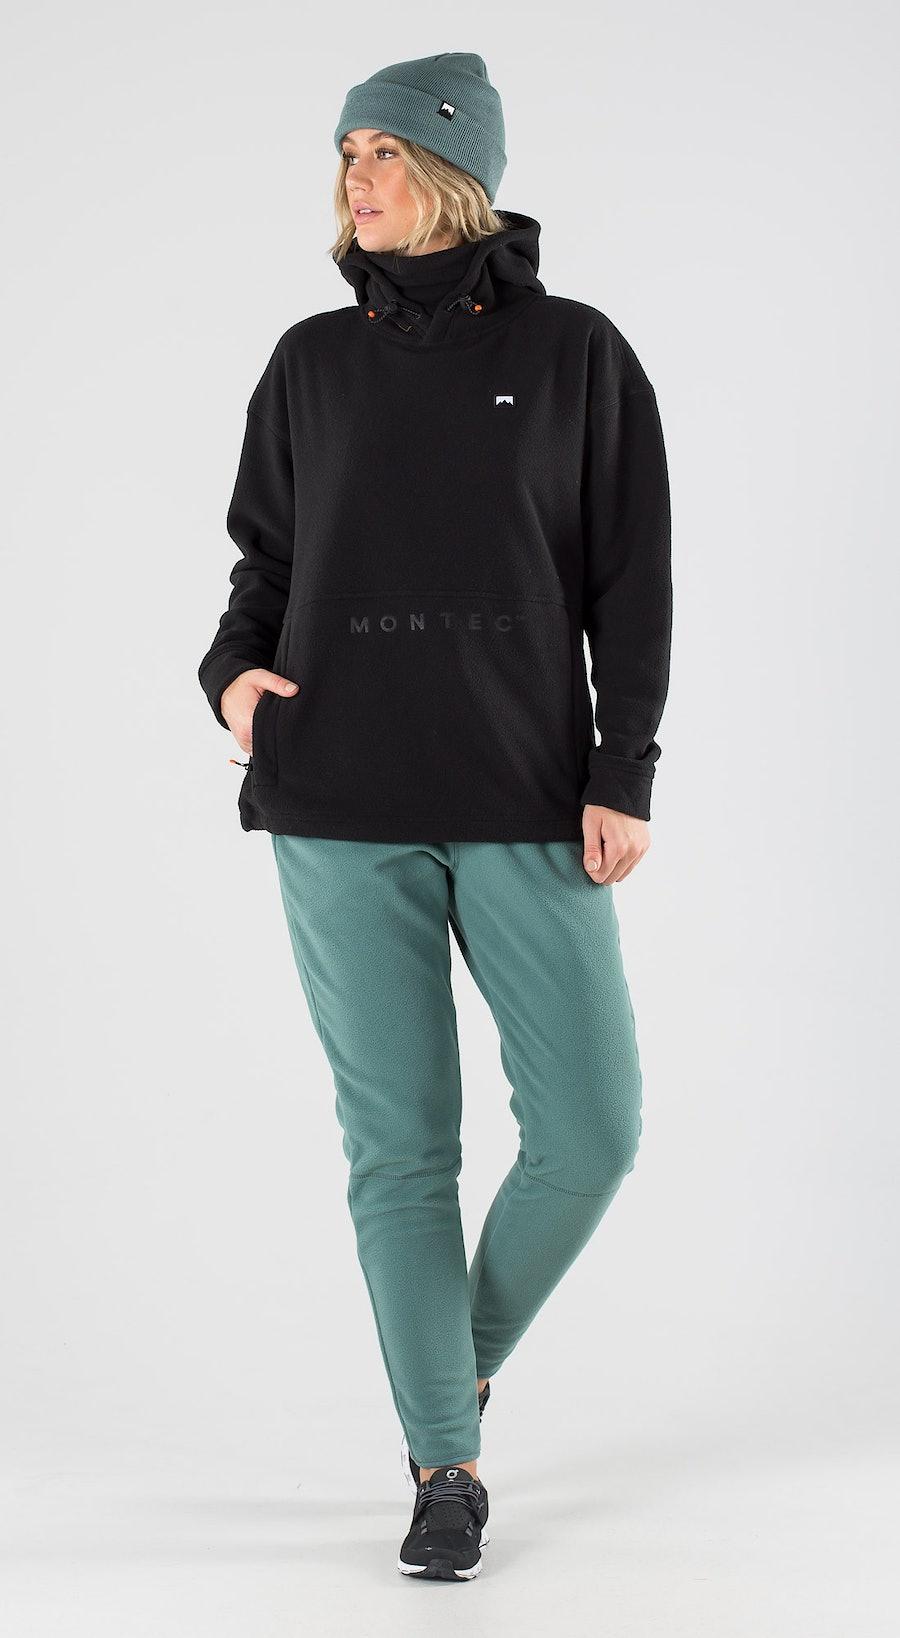 Montec Delta W Black Outfit Multi